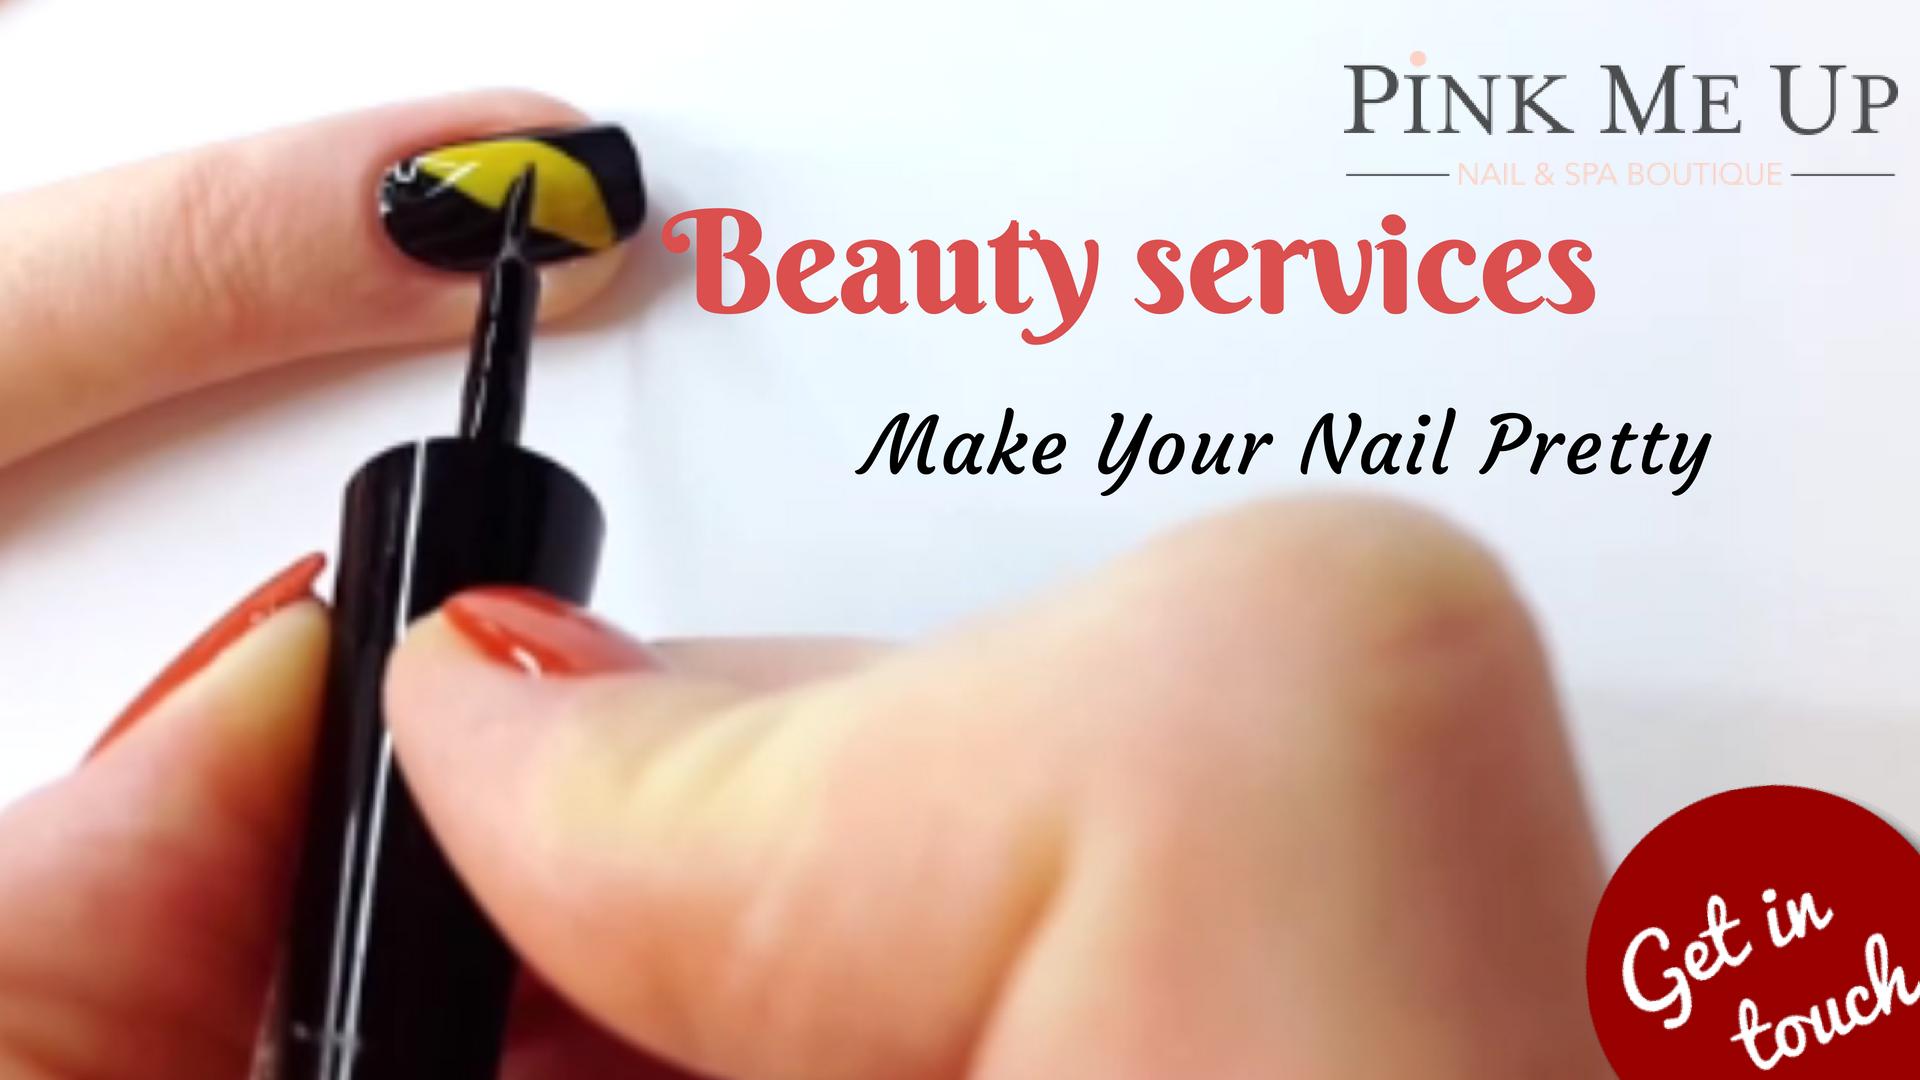 Natural Nail Services In Tarzana Sherman Oaks Pinkmeupnails Com Nail Services Natural Nails Nails